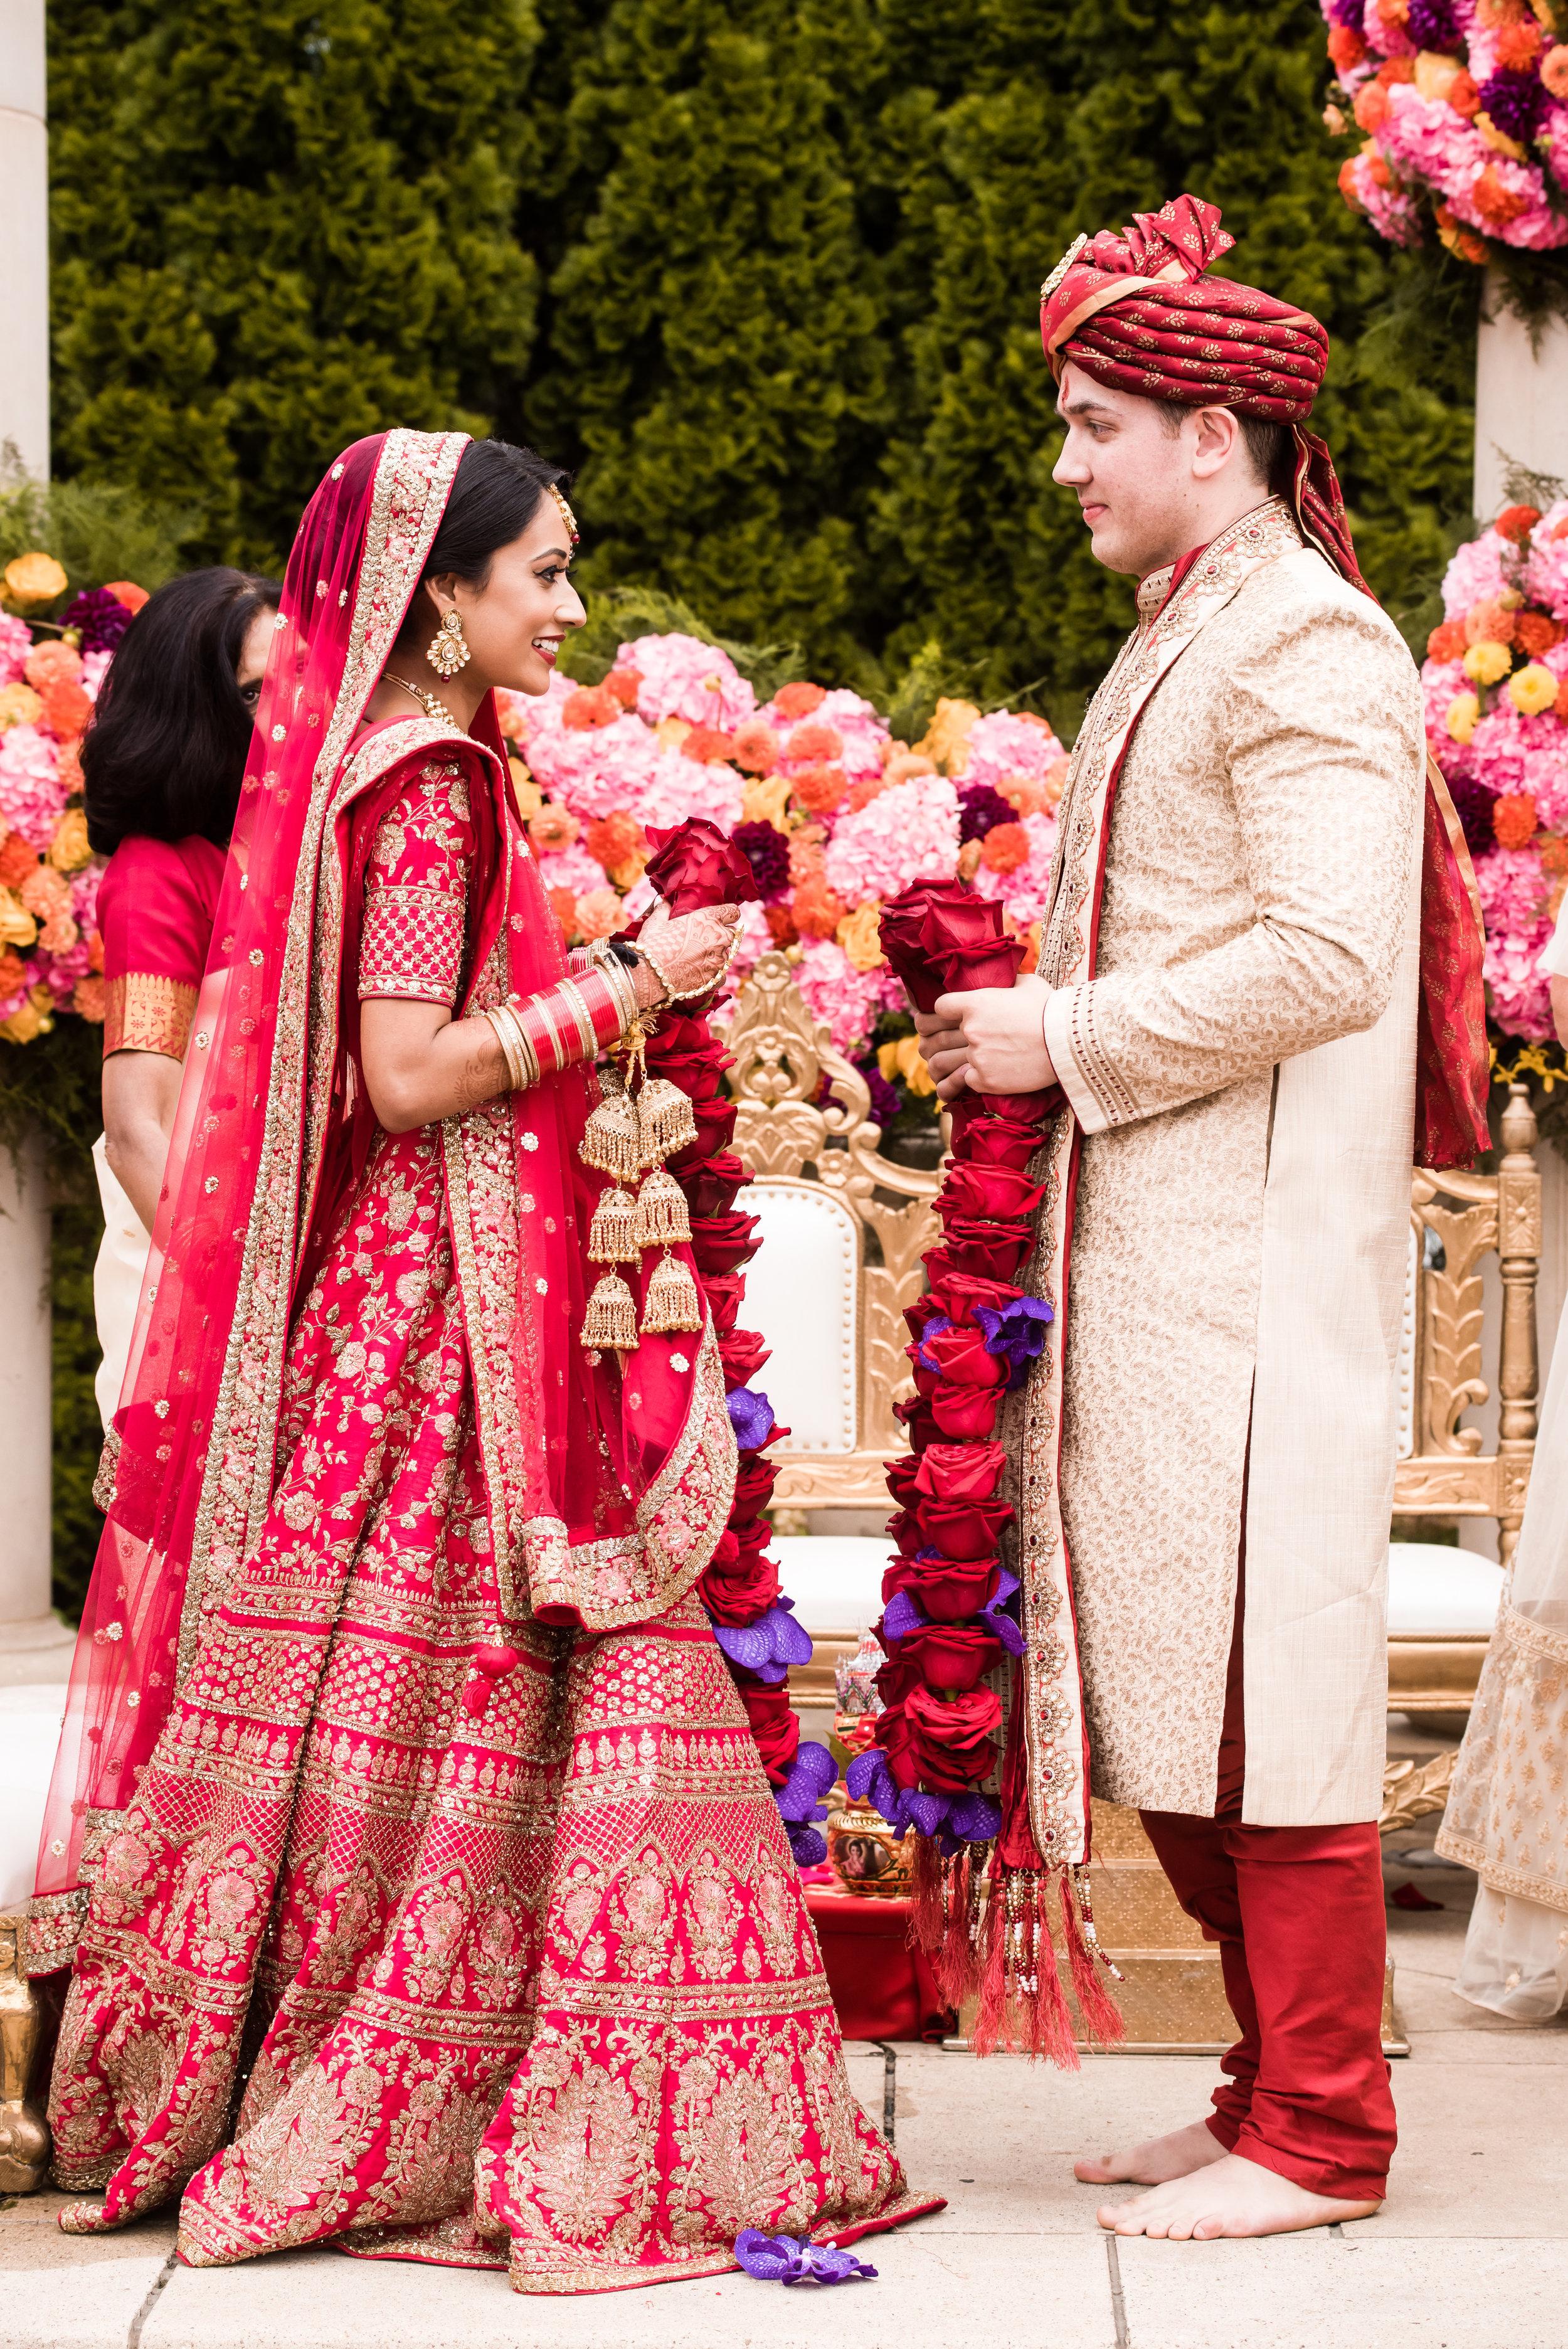 INDIAN WEDDING BRIDE AND GROOM CEREMONY.jpg